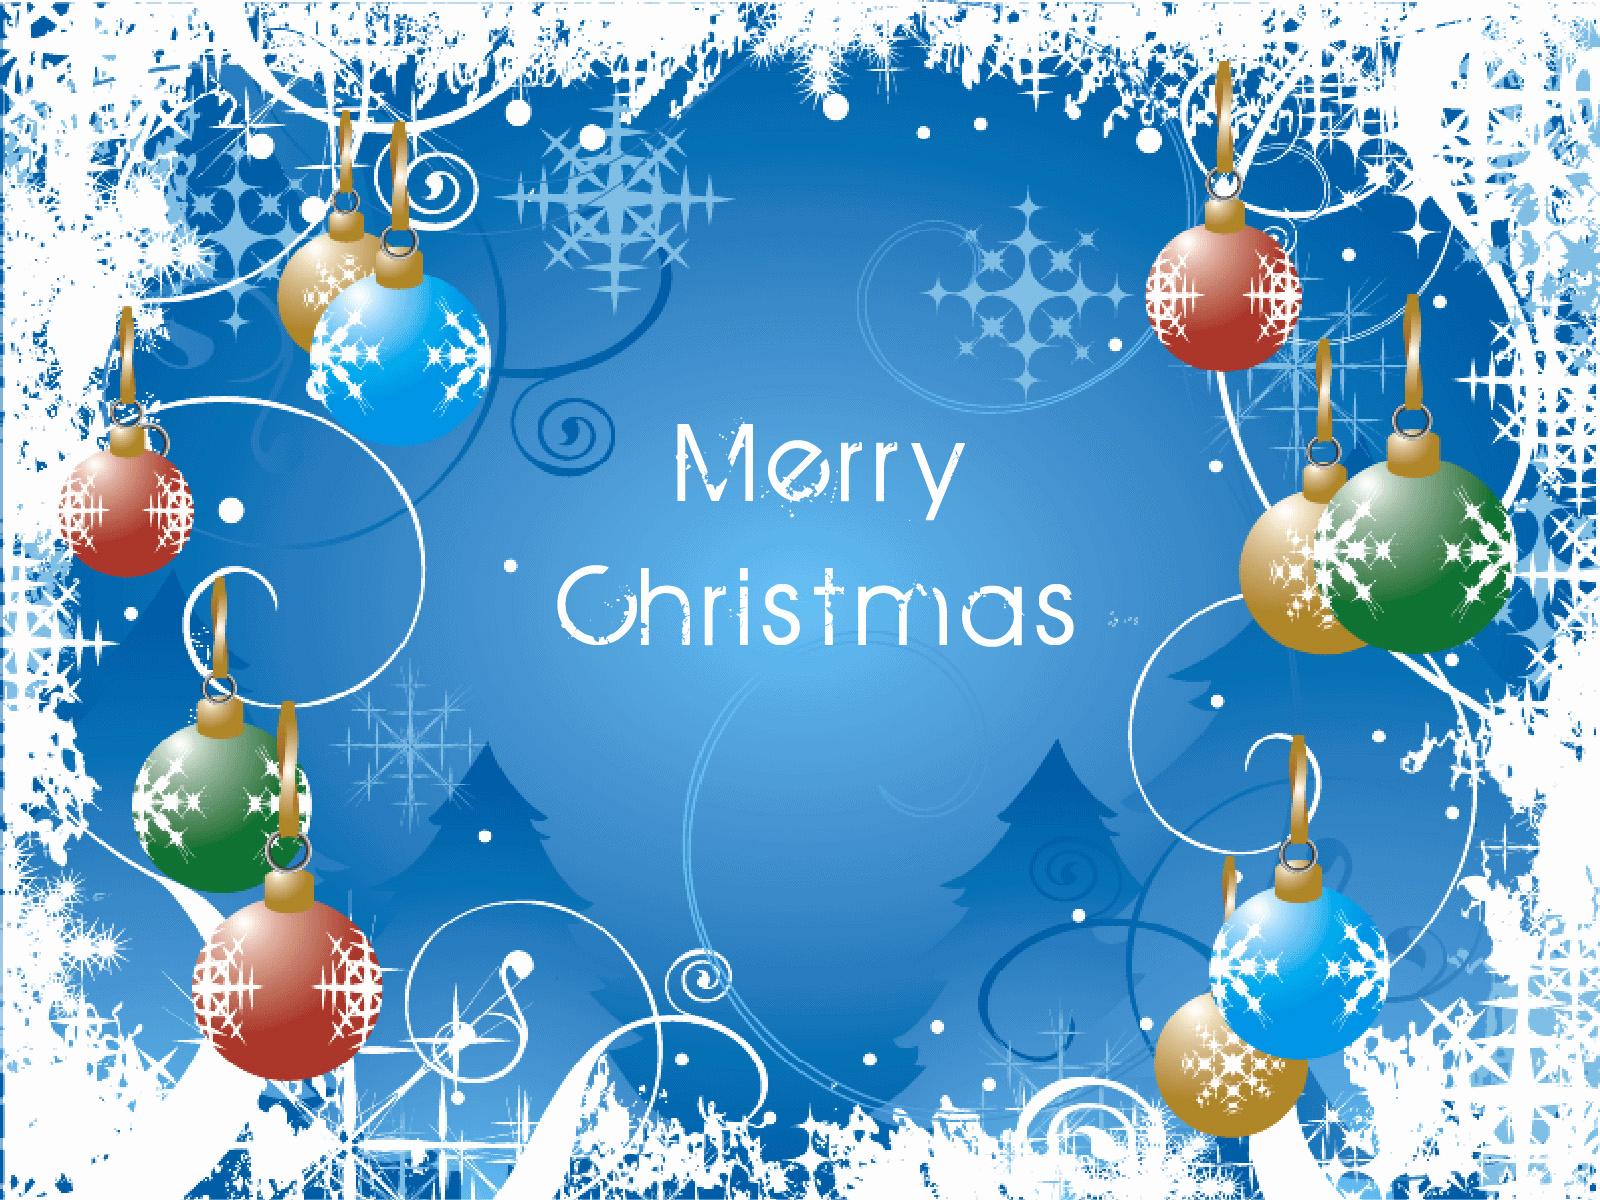 Free Christmas Desktop Wallpaper Inspirational Download Hd Christmas & New Year 2018 Bible Verse